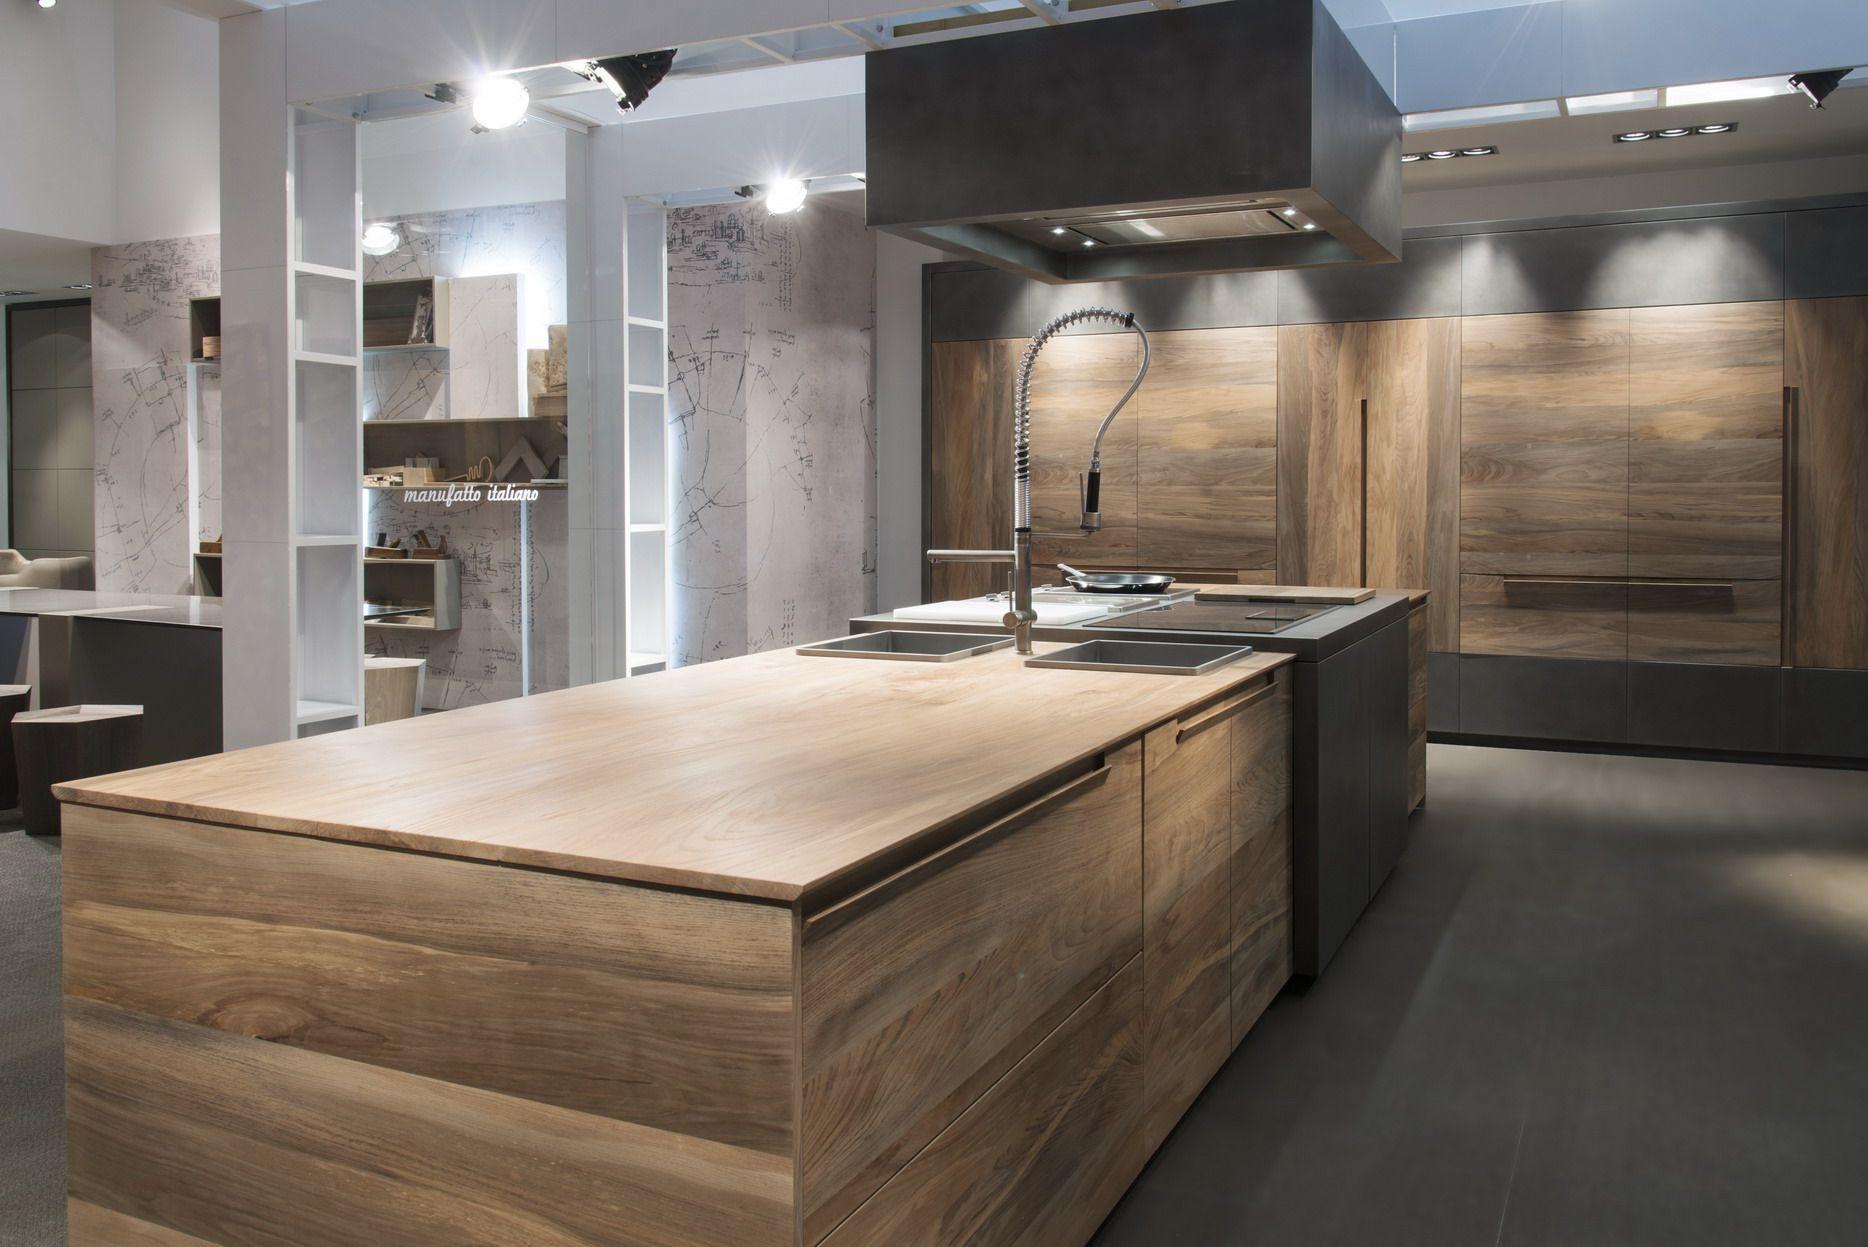 Pittura Moderna Per Interni Cucina. Interni Della Cucina ...